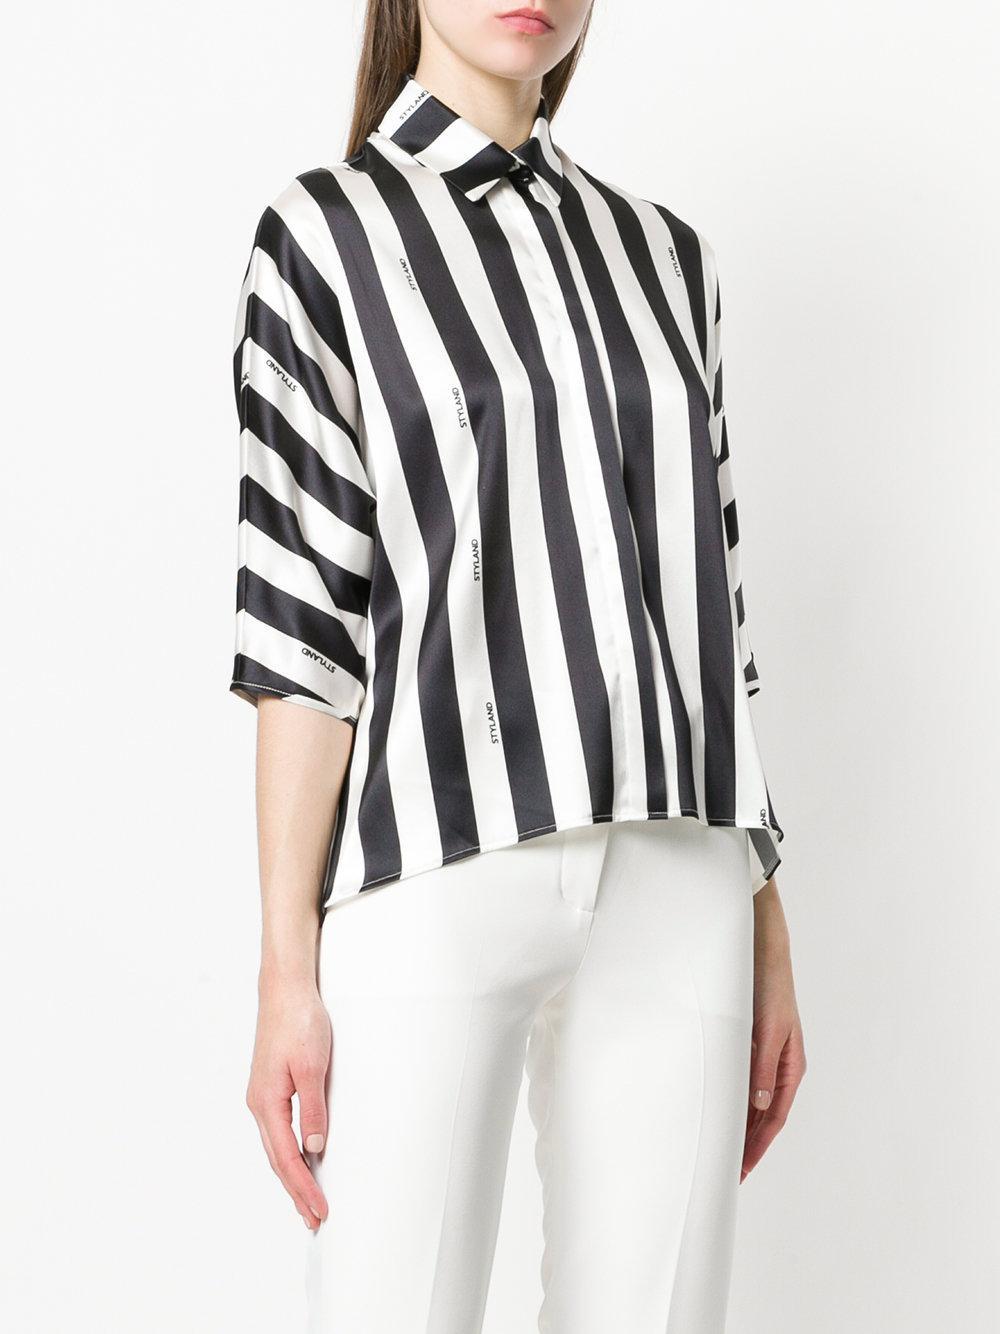 2018 Cheap Online classic collar blouse - Black Styland Cheap Sale Very Cheap N4JXInZ